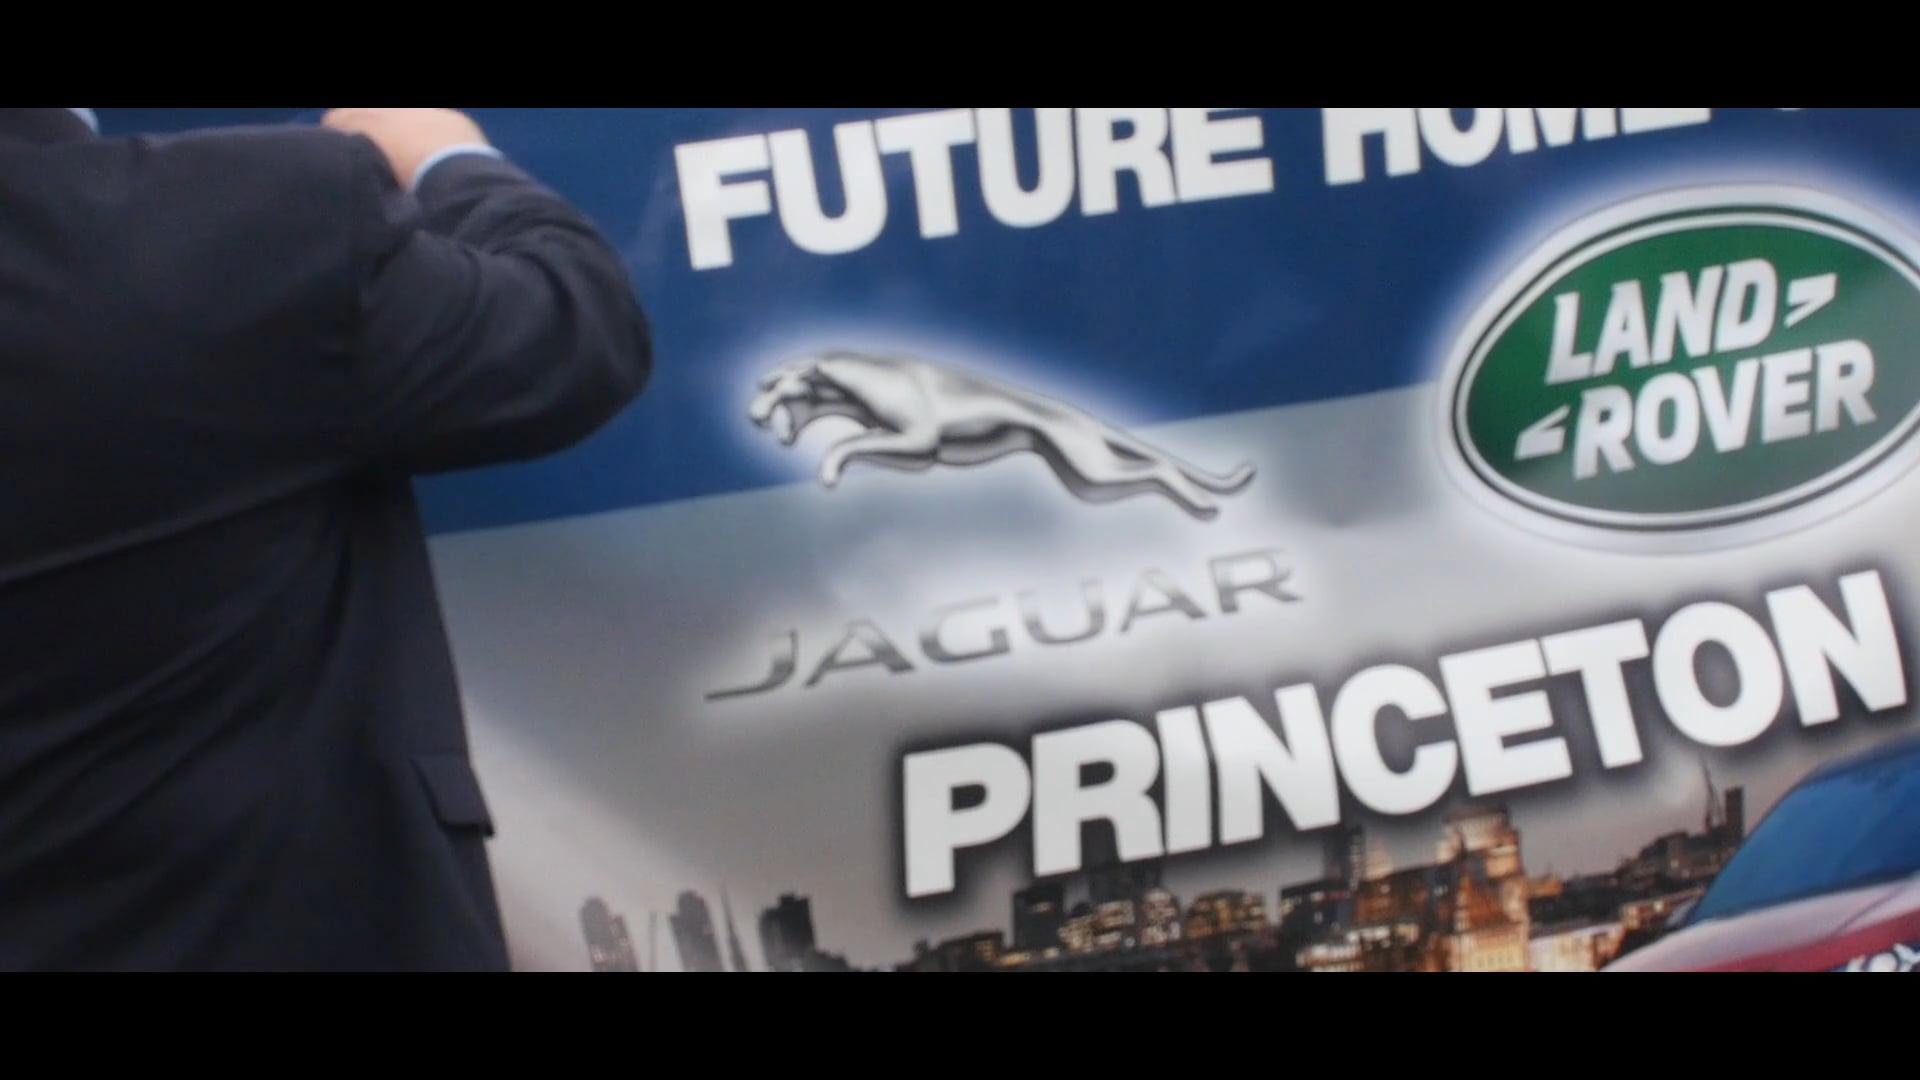 PRINCETON JAGUAR LANDROVER GROUNDBREAK_REVISED 3-3